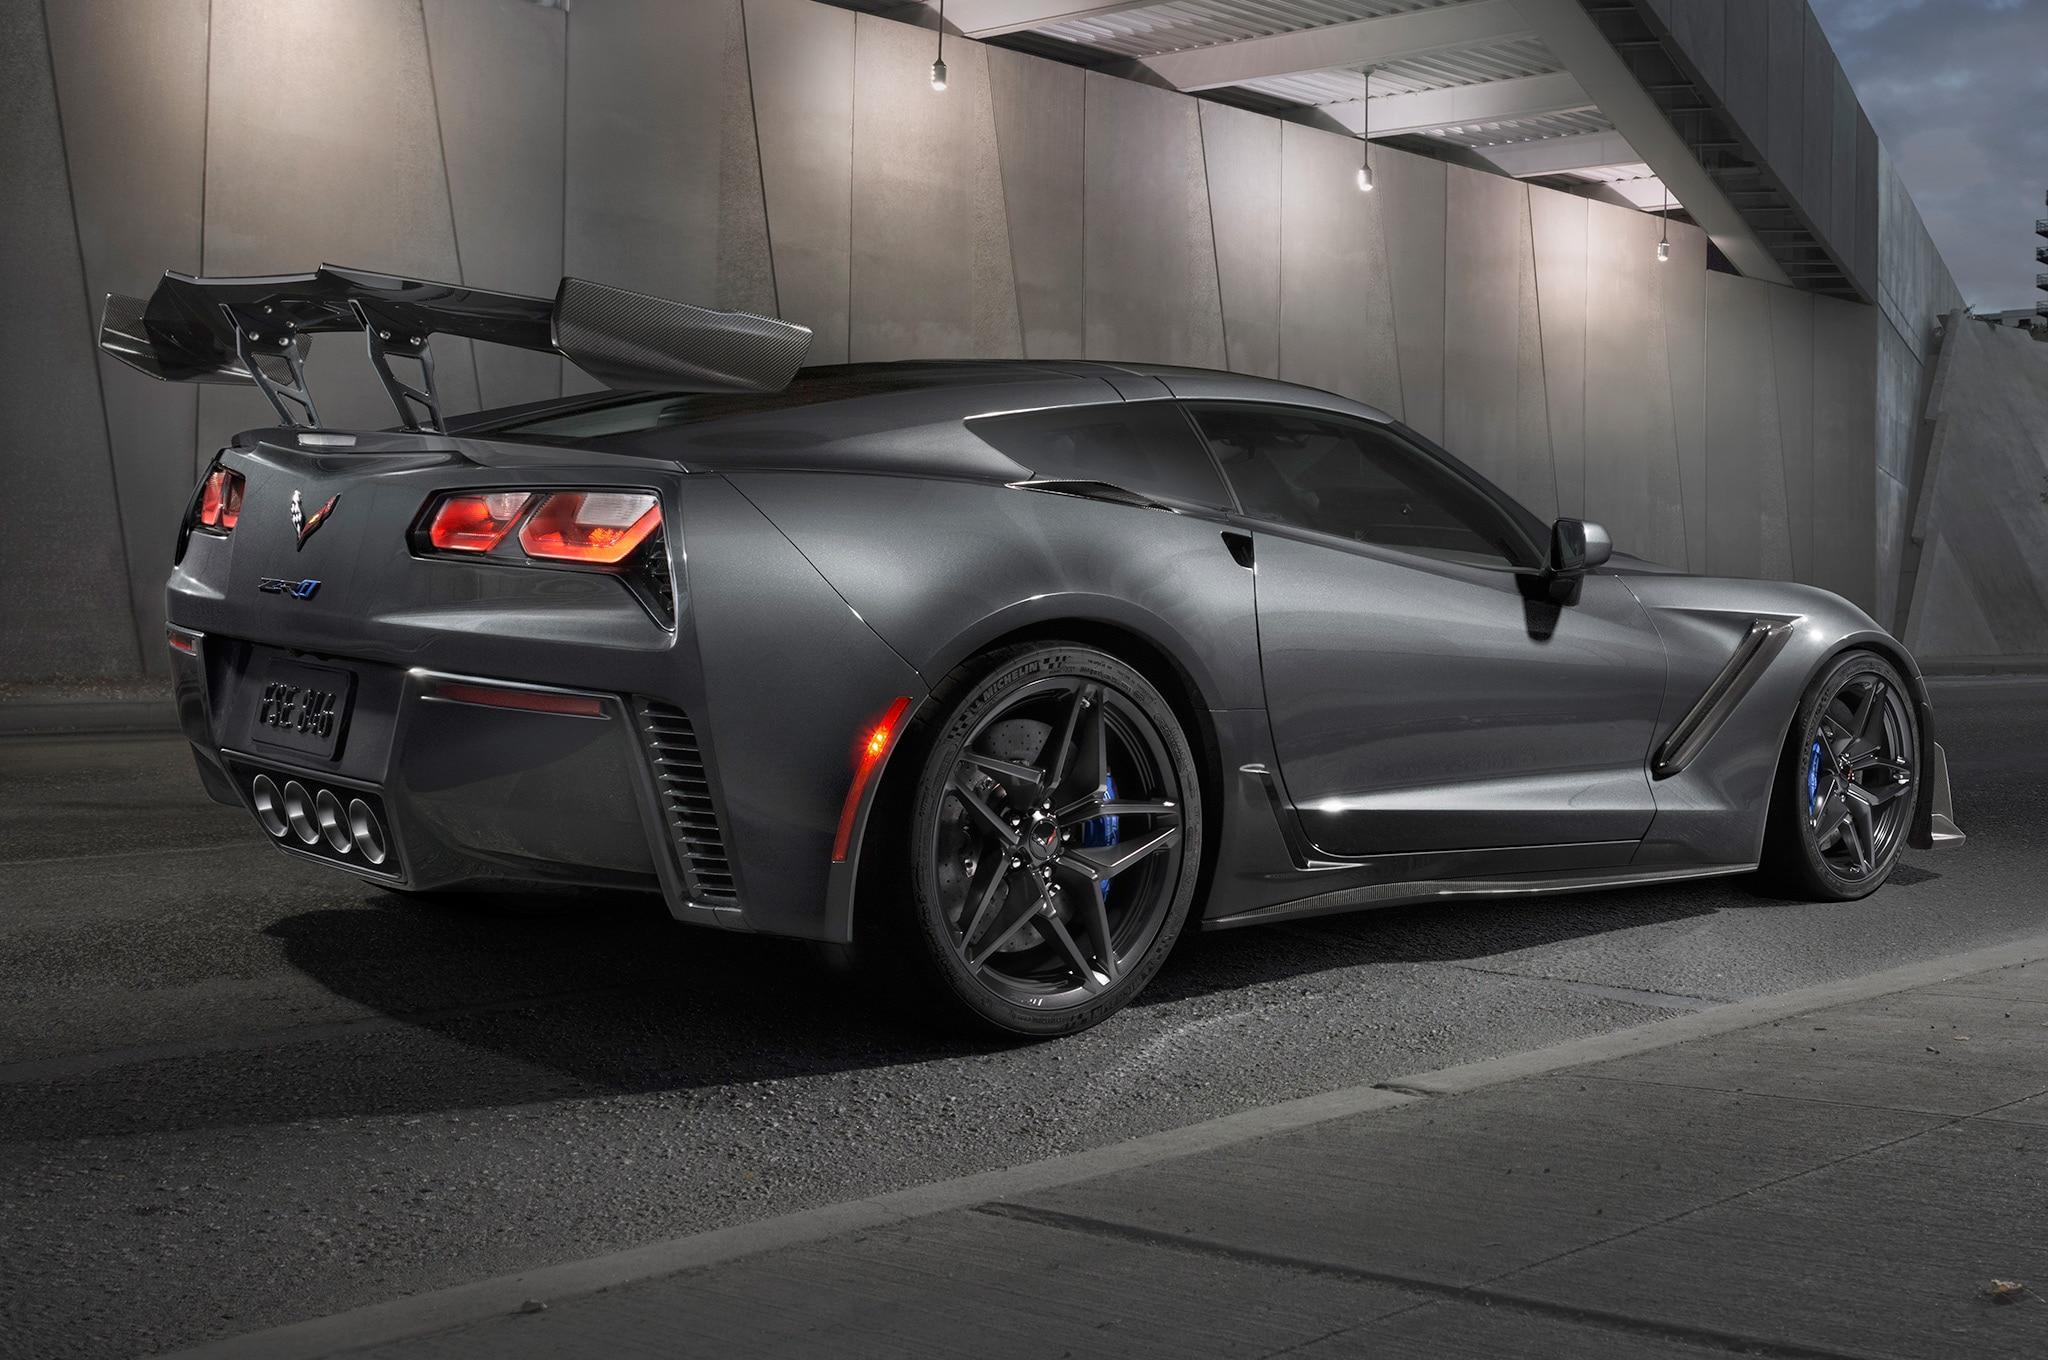 2019 Chevrolet Corvette ZR1 Rear Three Quarter High Wing